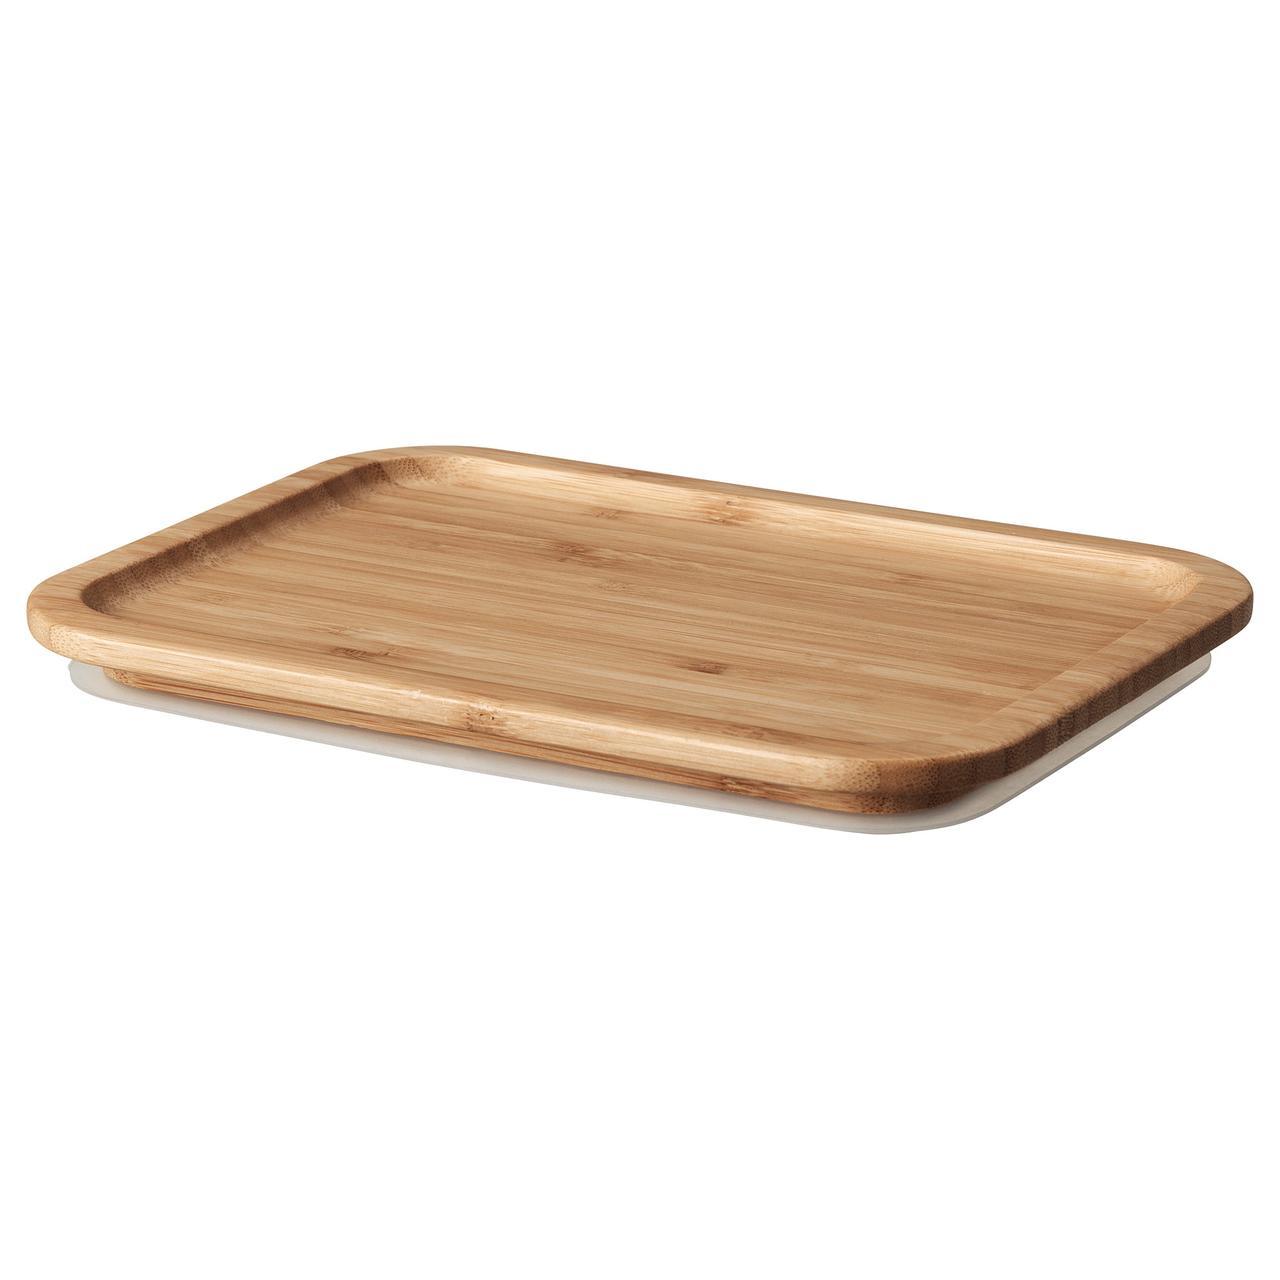 "IKEA ""ИКЕА/365+"" Крышка, прямоугольн формы, бамбук, 21*15 см, фото 1"